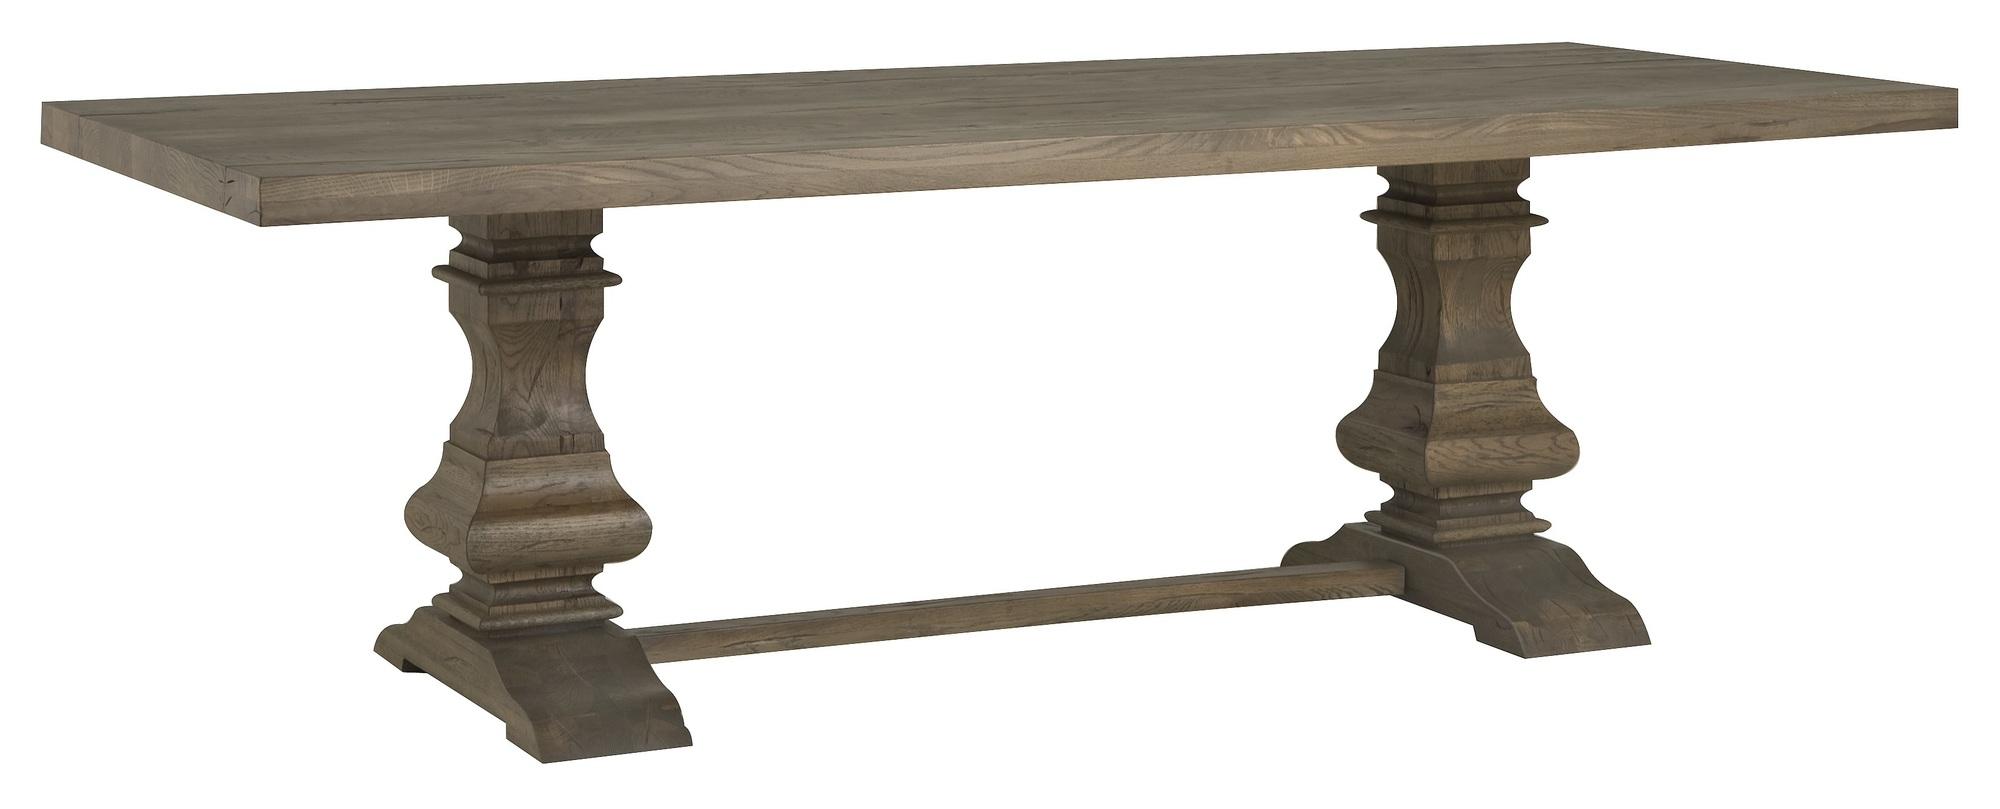 tafel-stijn-towerliving-BM 1060-kloostertafel